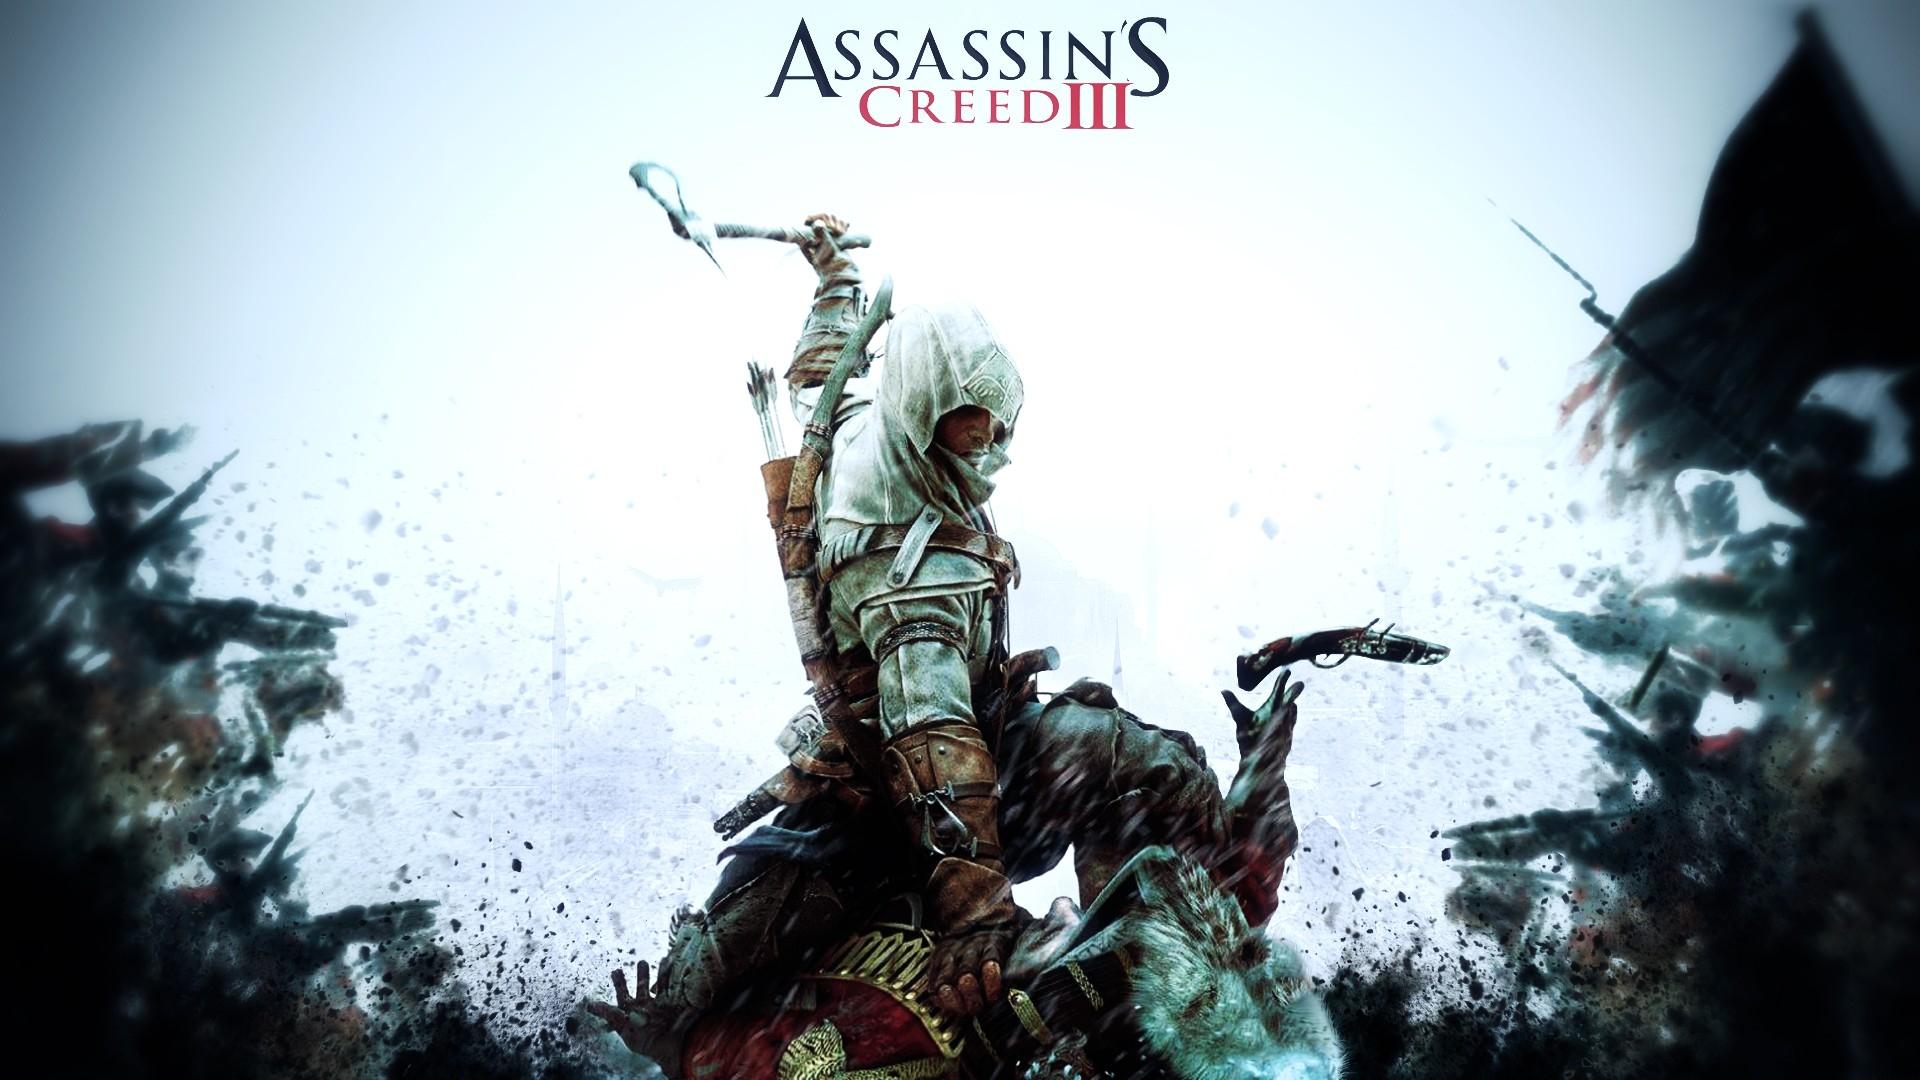 Fondos De Pantalla Assassins Creed 3 Brazo Hacha